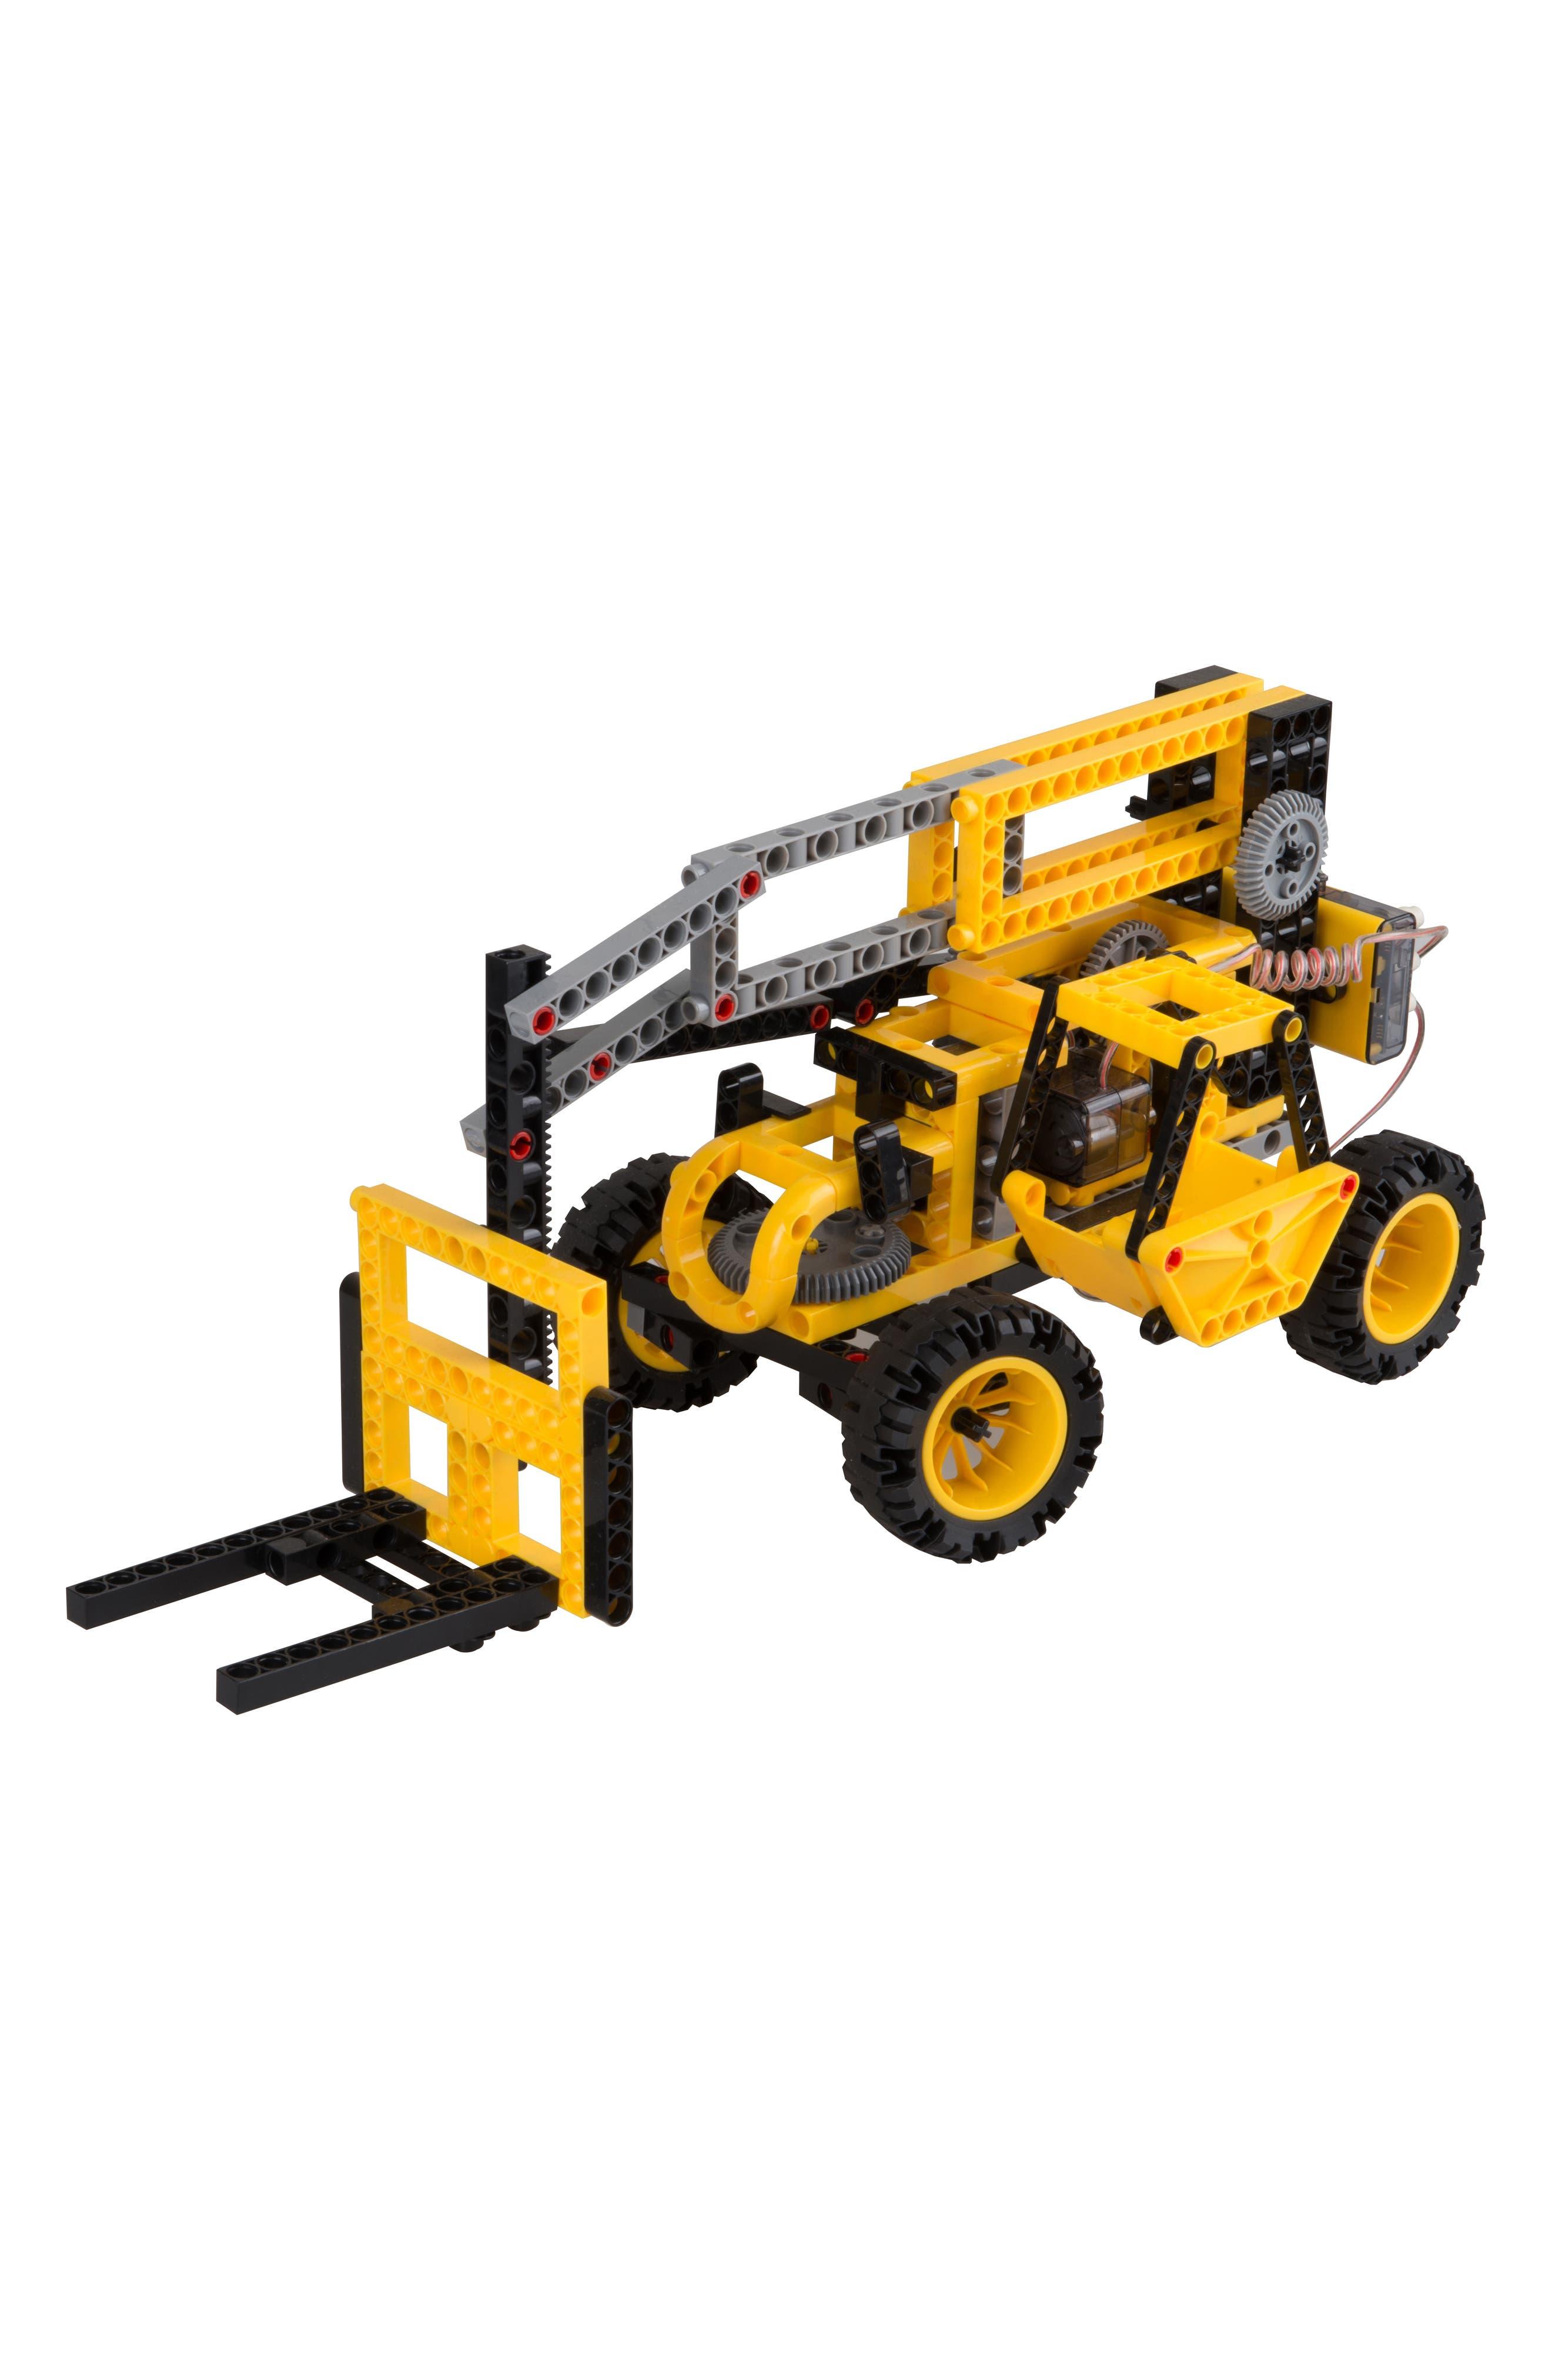 Remote Control Machines Construction Vehicles Kit,                             Alternate thumbnail 6, color,                             MULTI